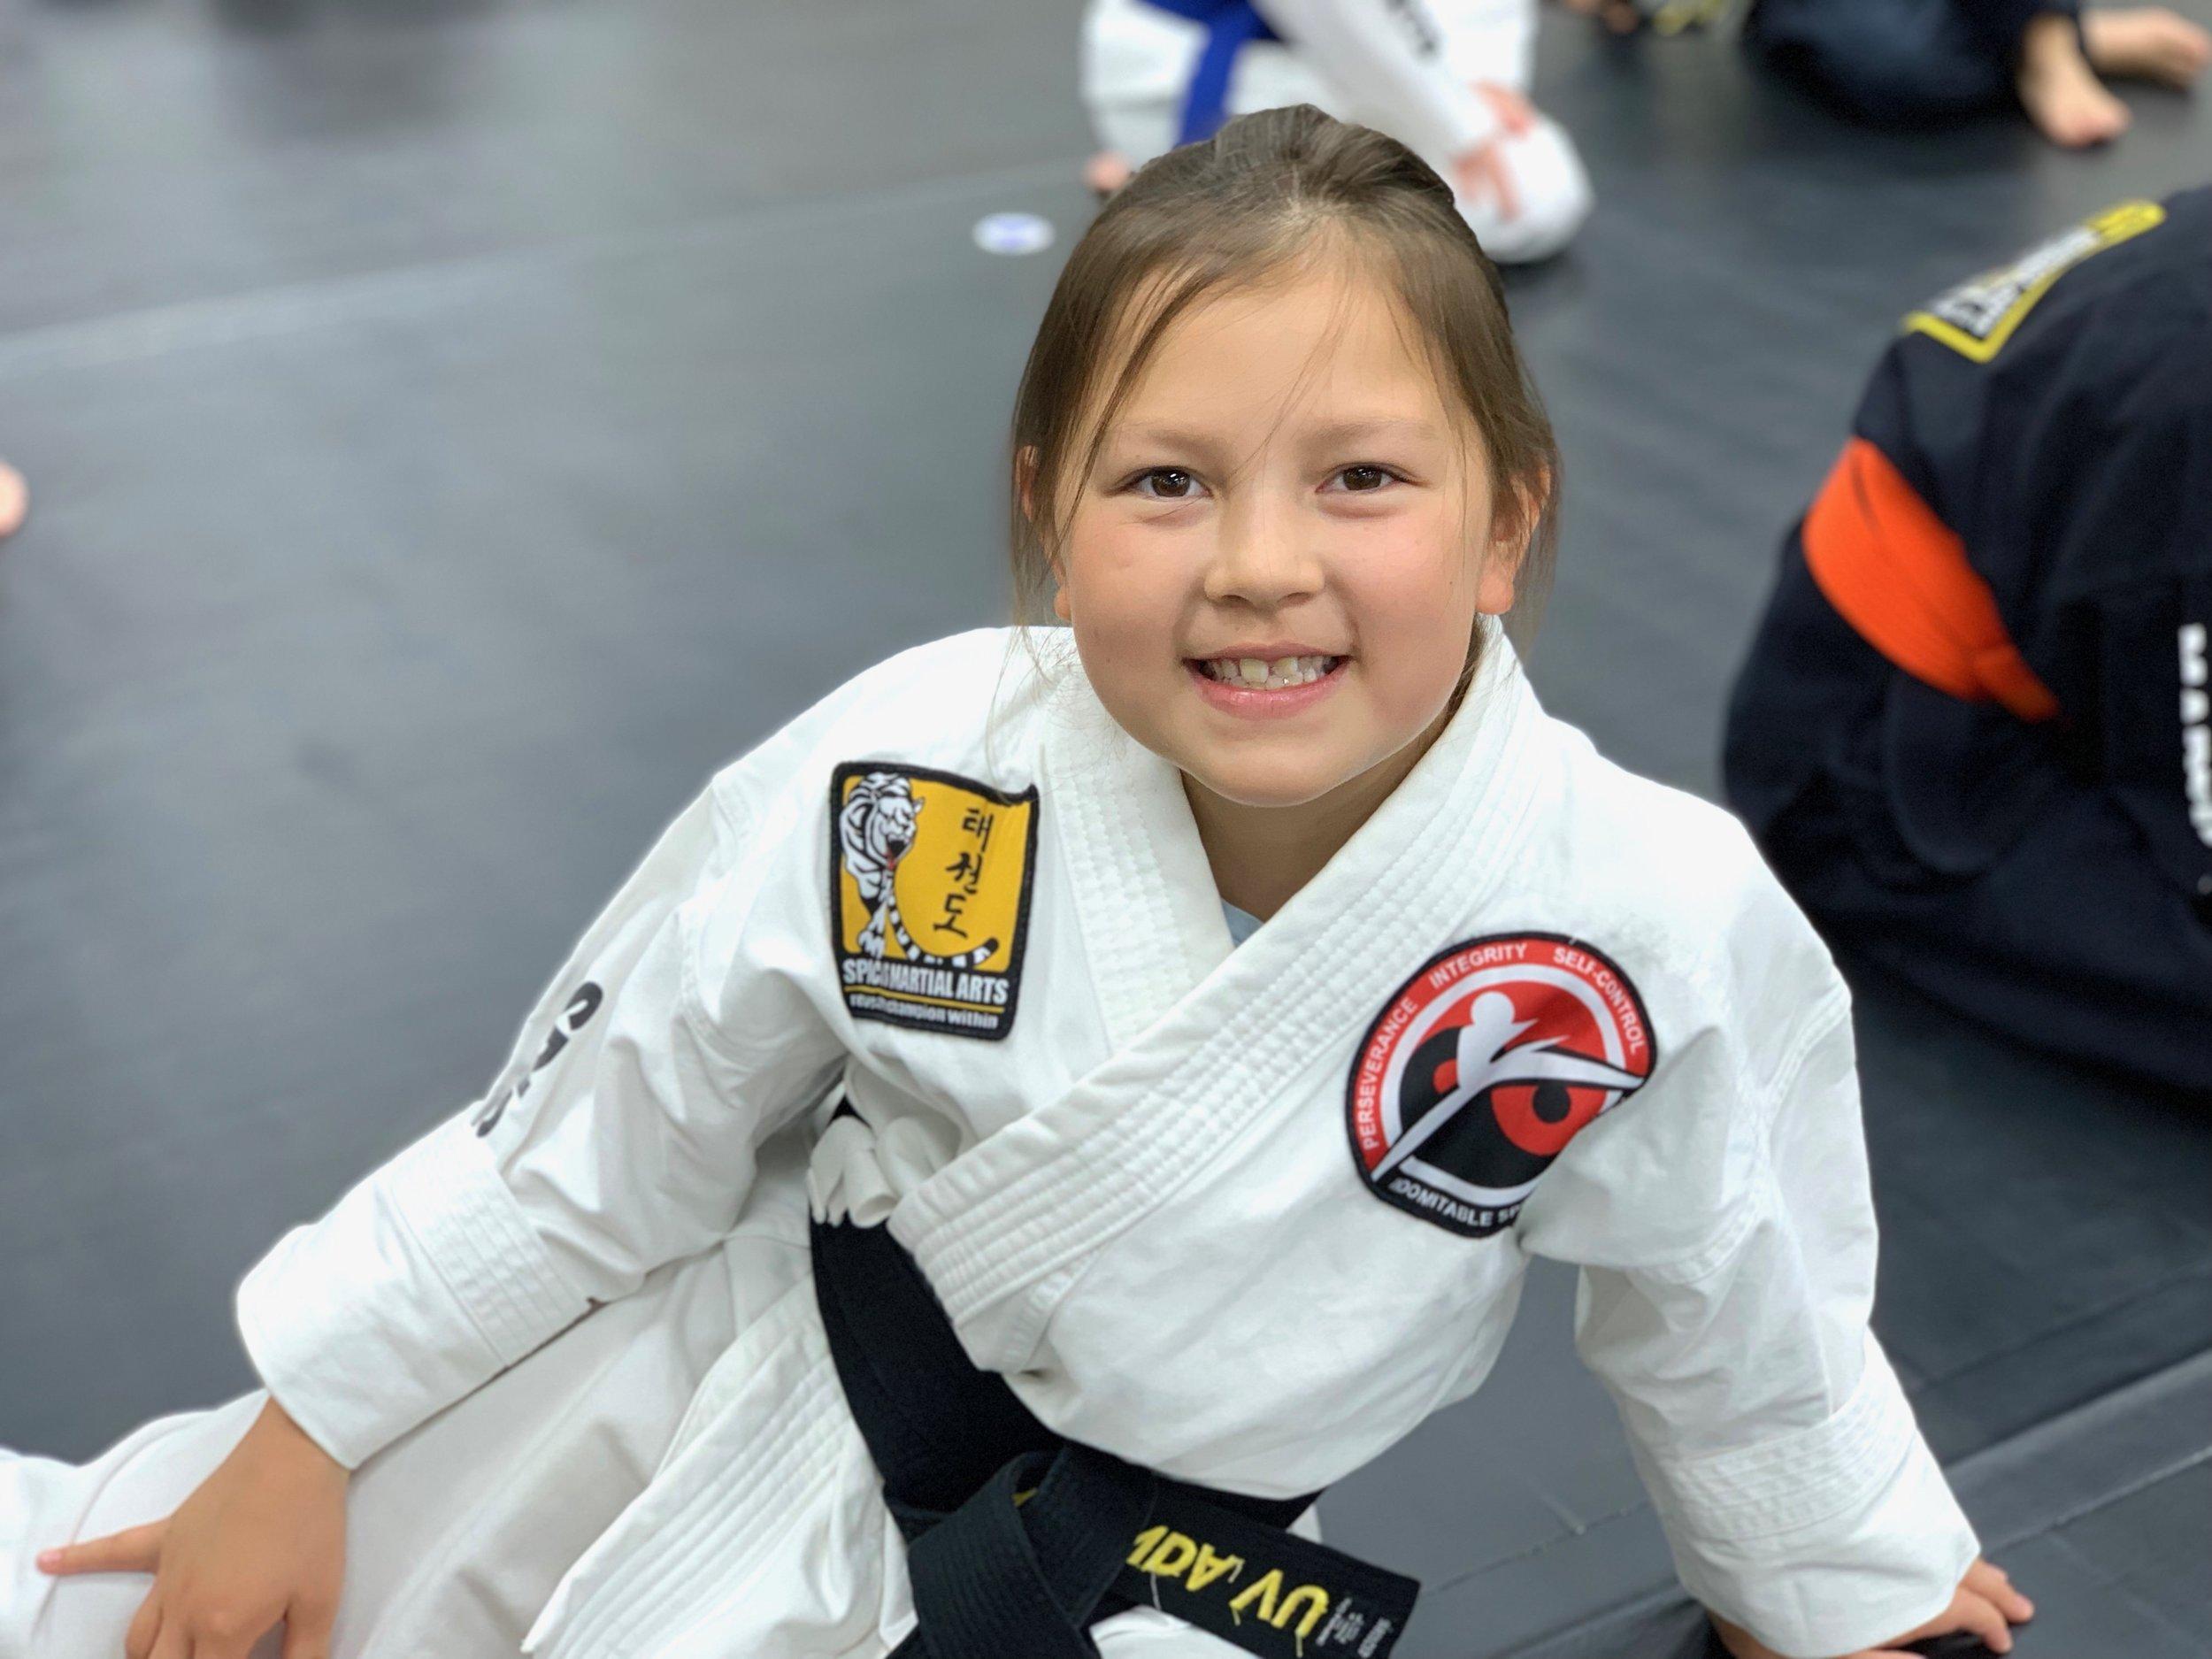 karate-kids-program-souhtlake-keller-grapevine-texas00023.jpeg